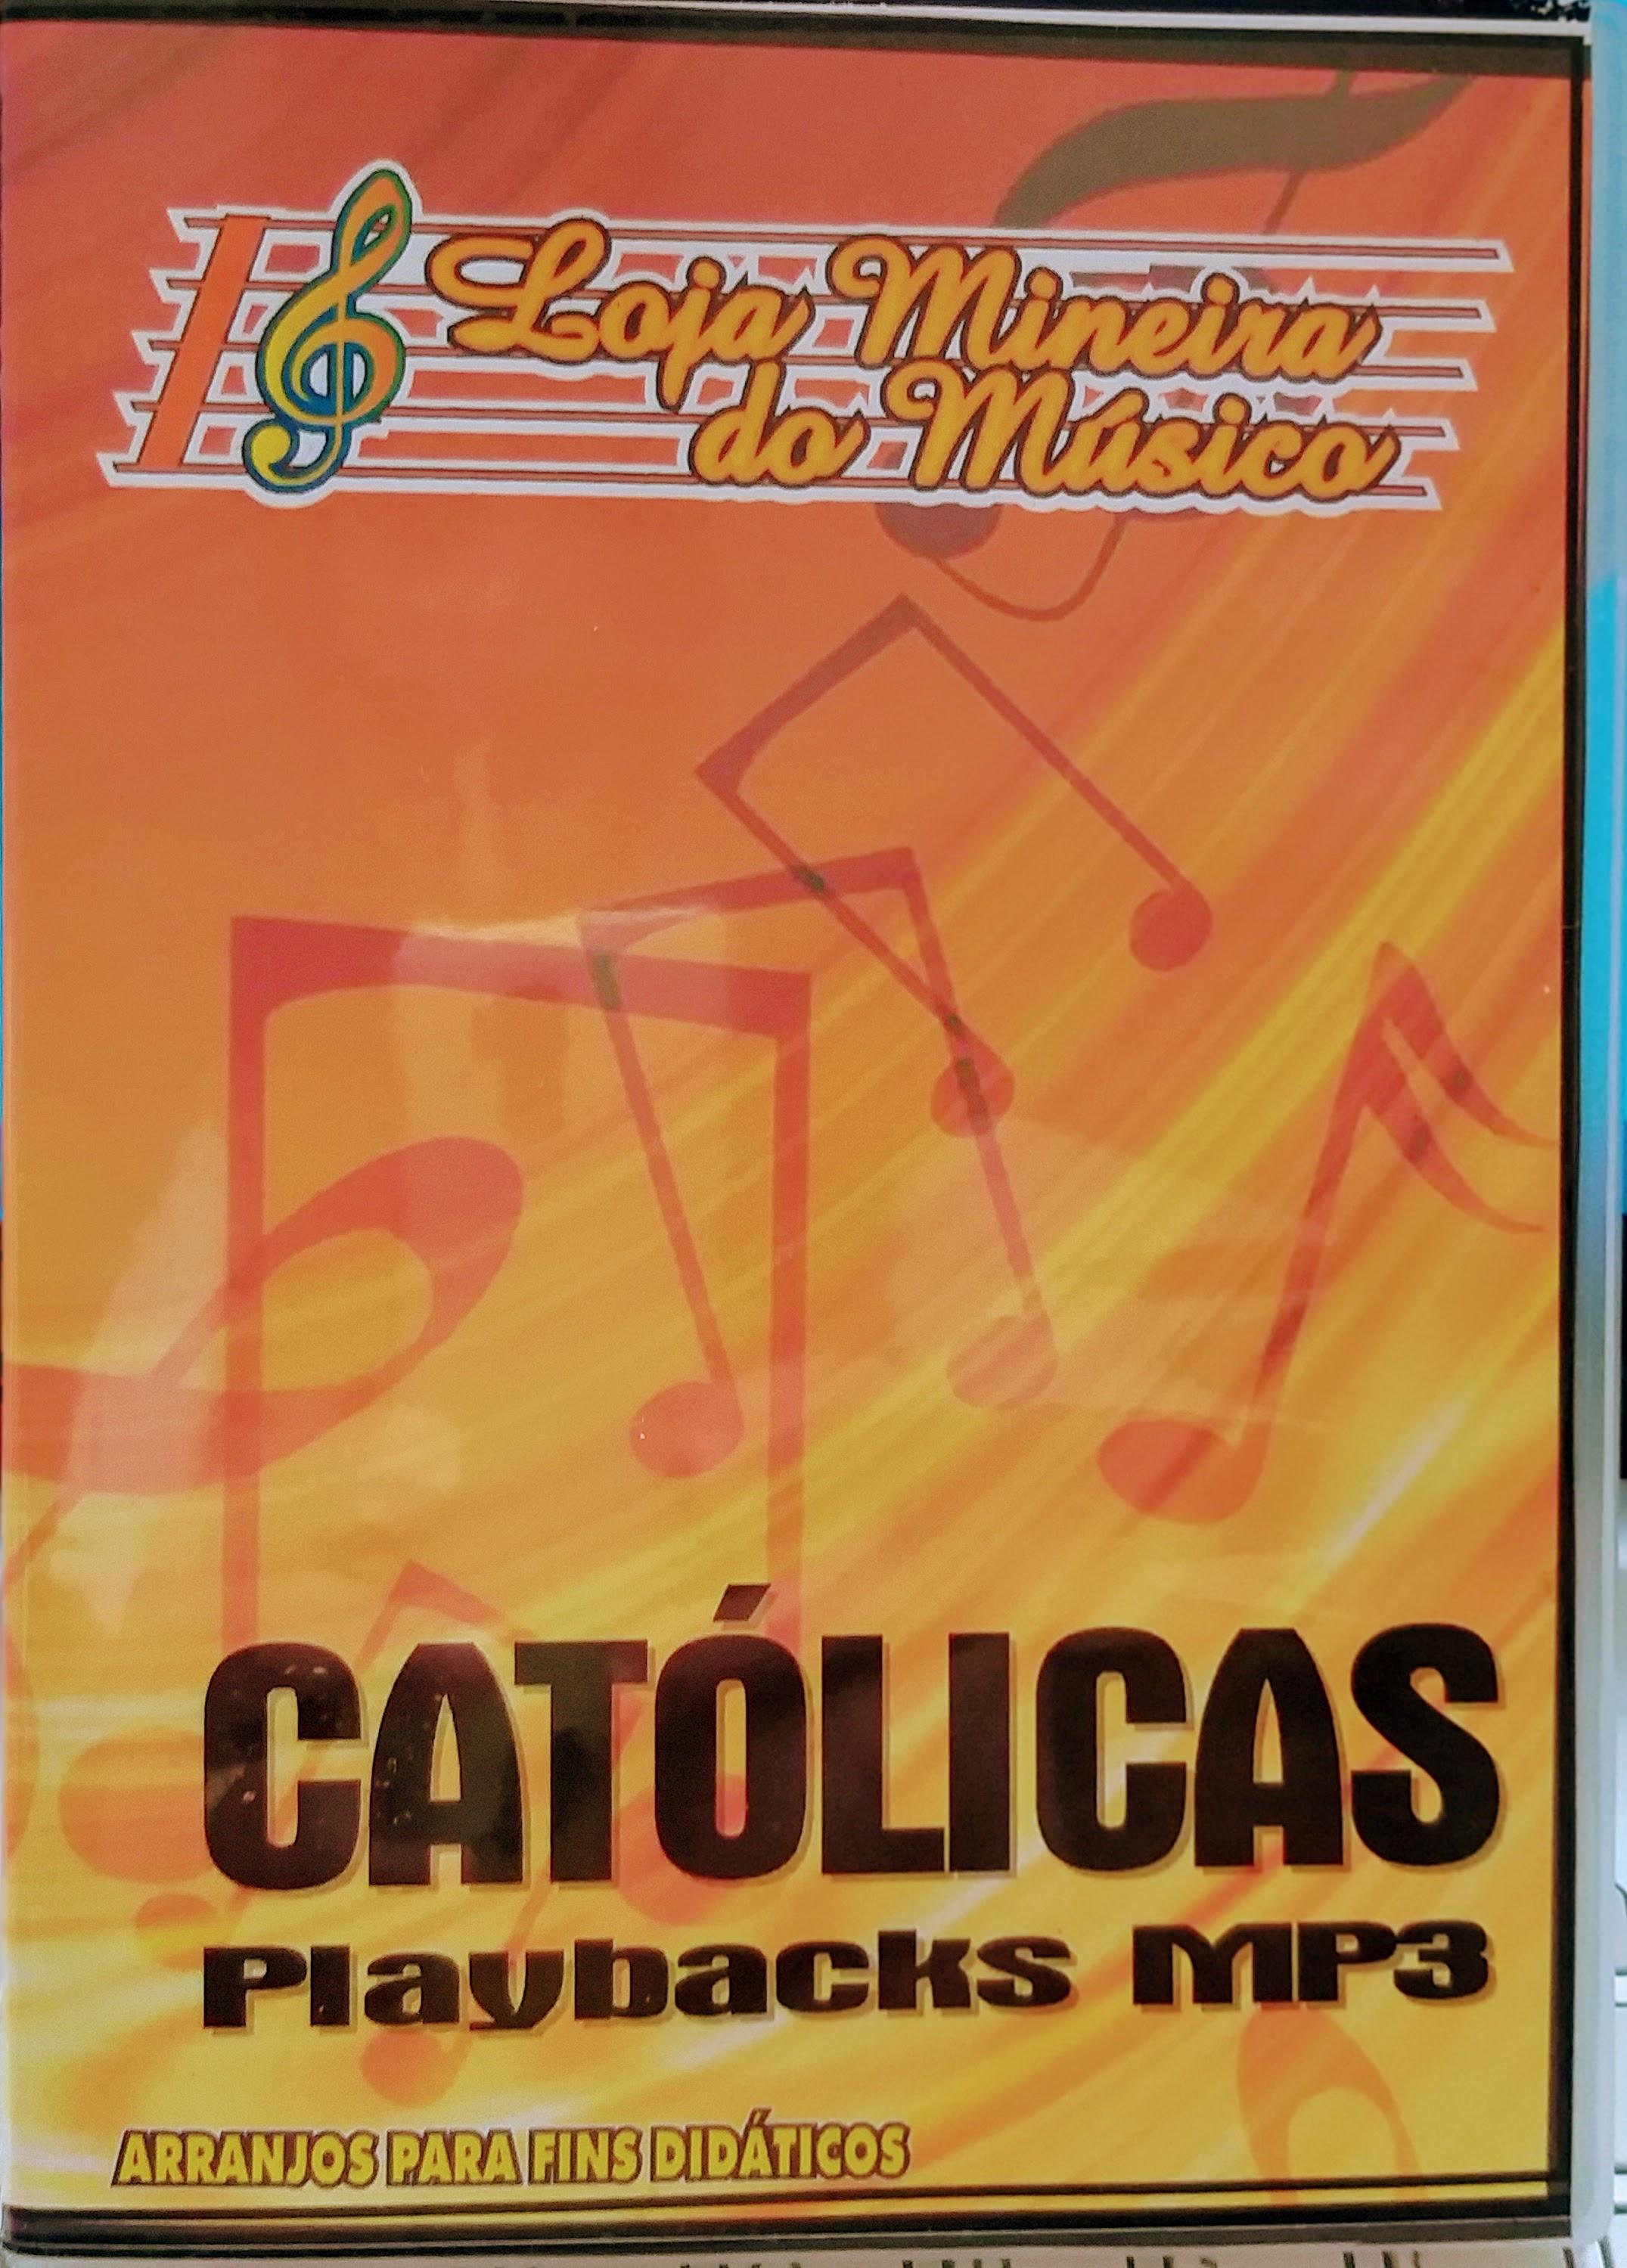 Playback Musica Catolica Karaoke